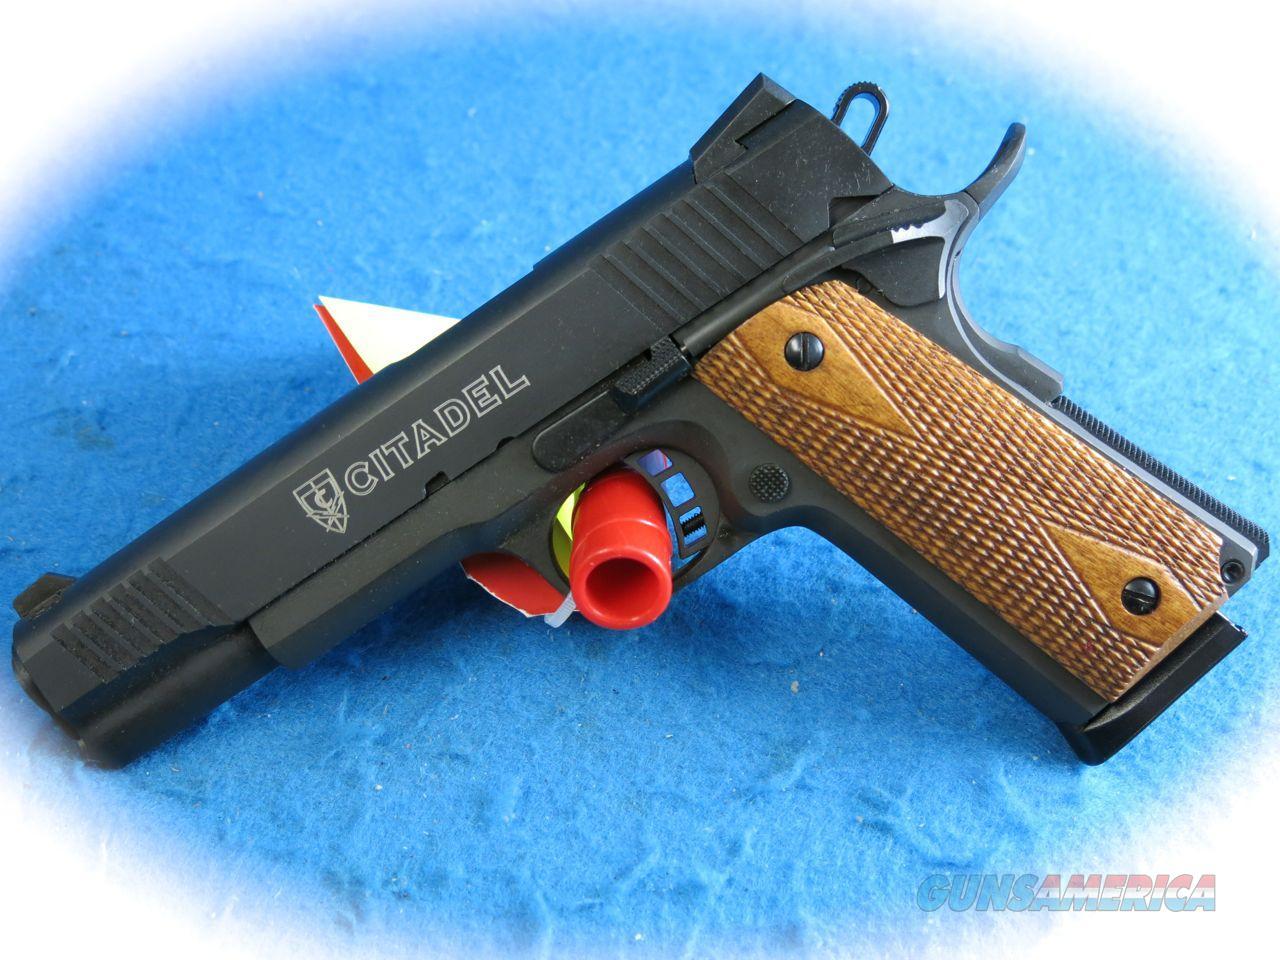 citadel m 1911 45 acp full size pistol new for sale. Black Bedroom Furniture Sets. Home Design Ideas